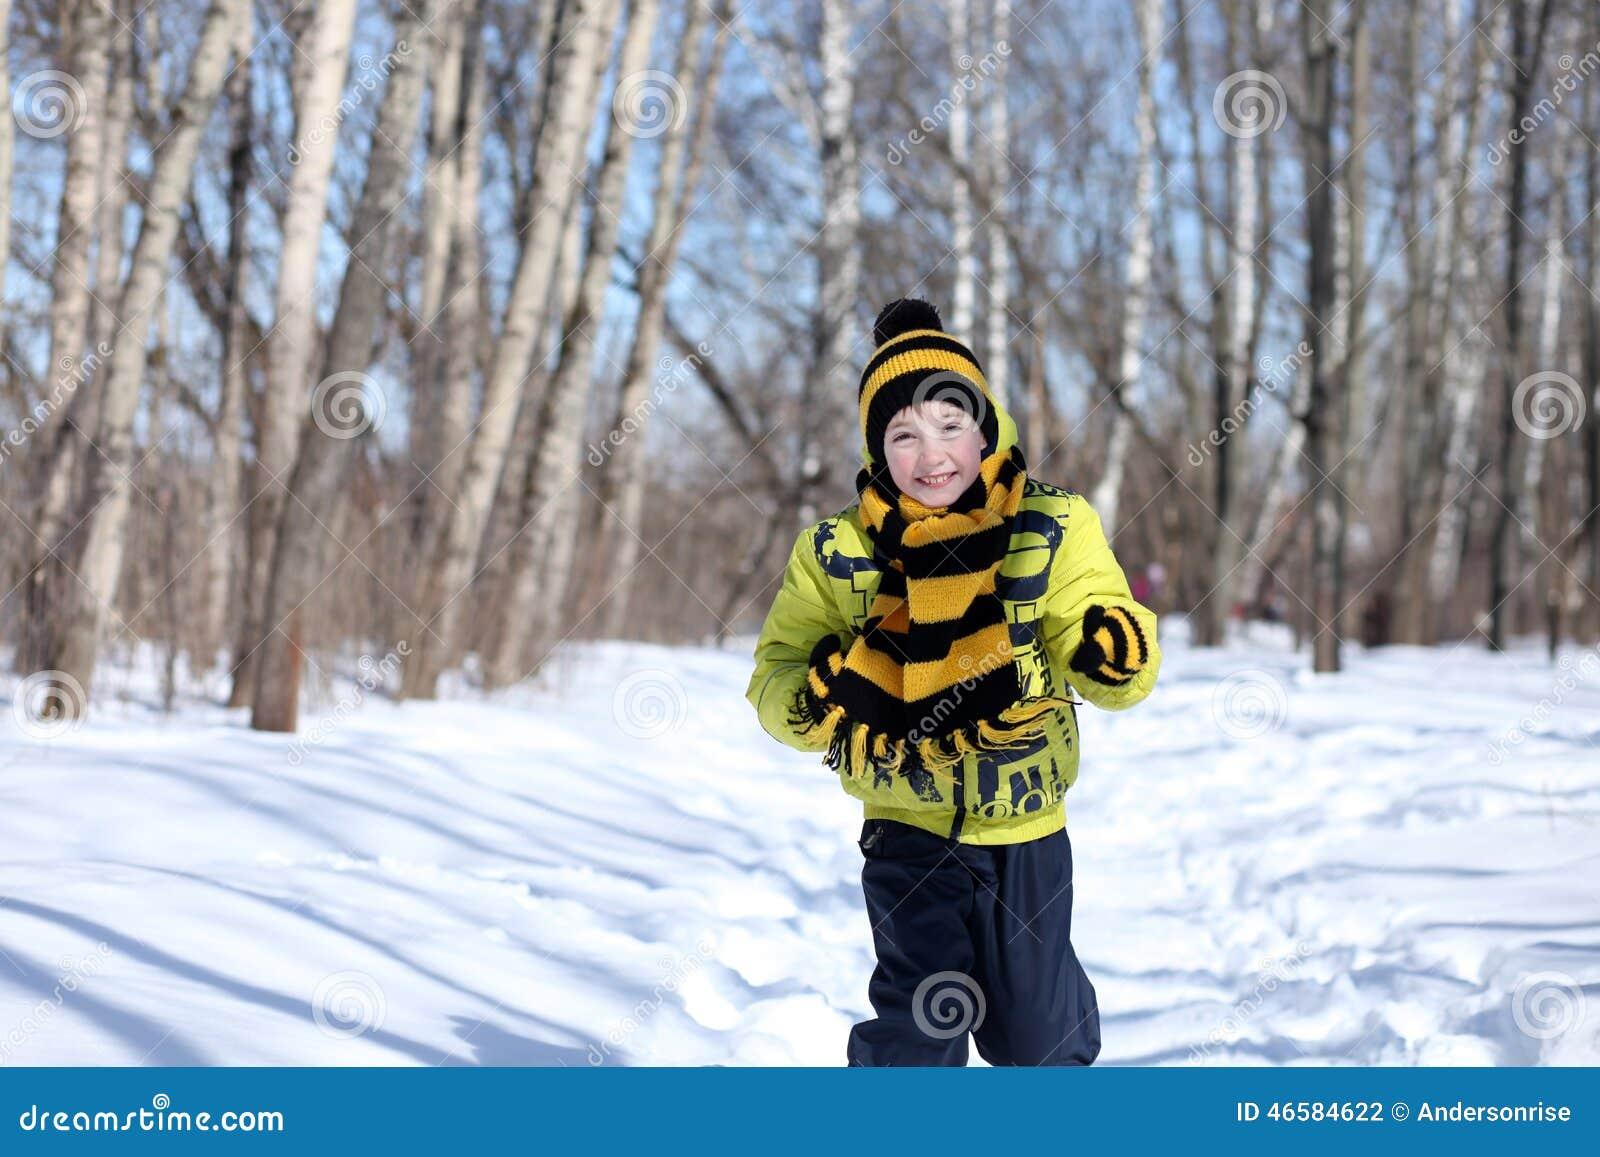 Boy in a winter park